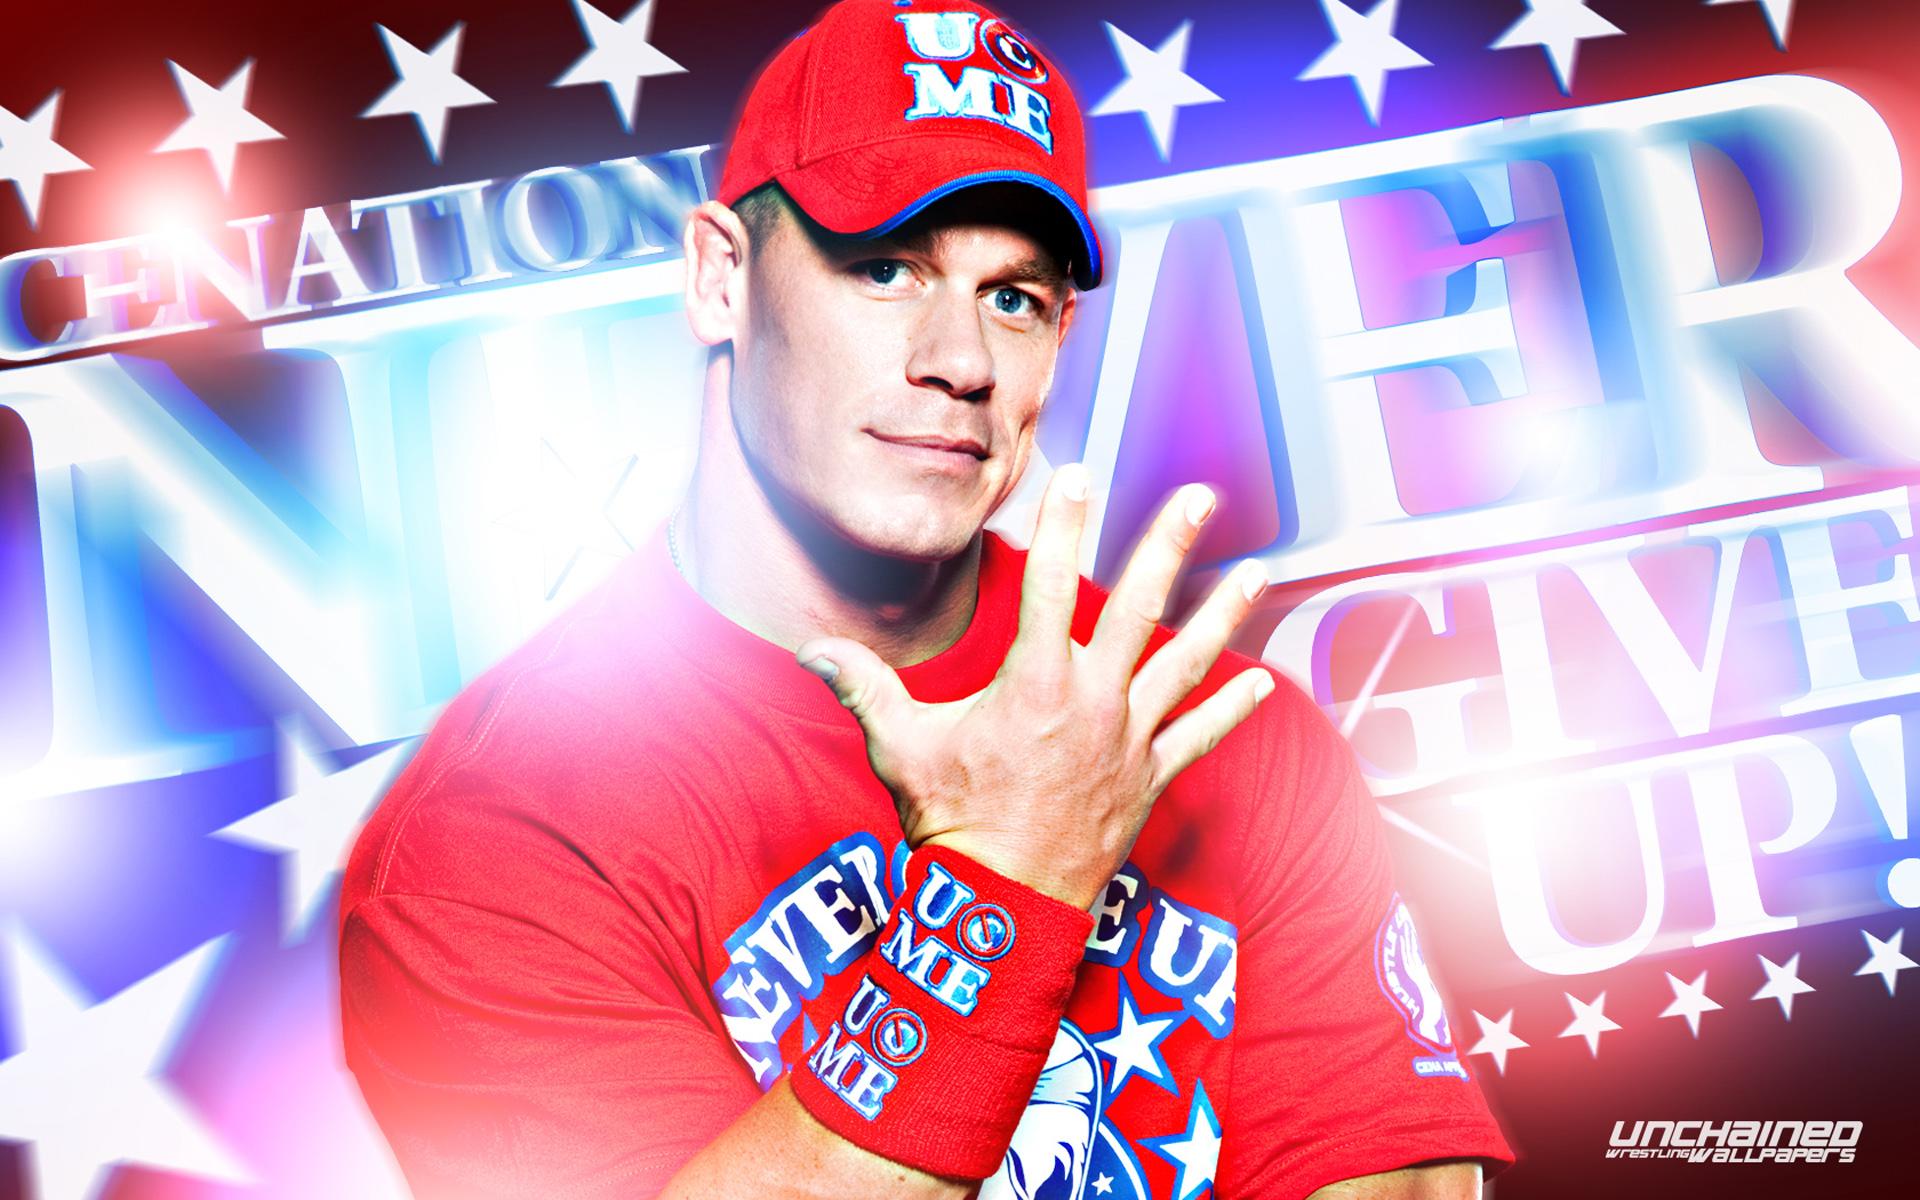 John Cena Wallpaper Cool